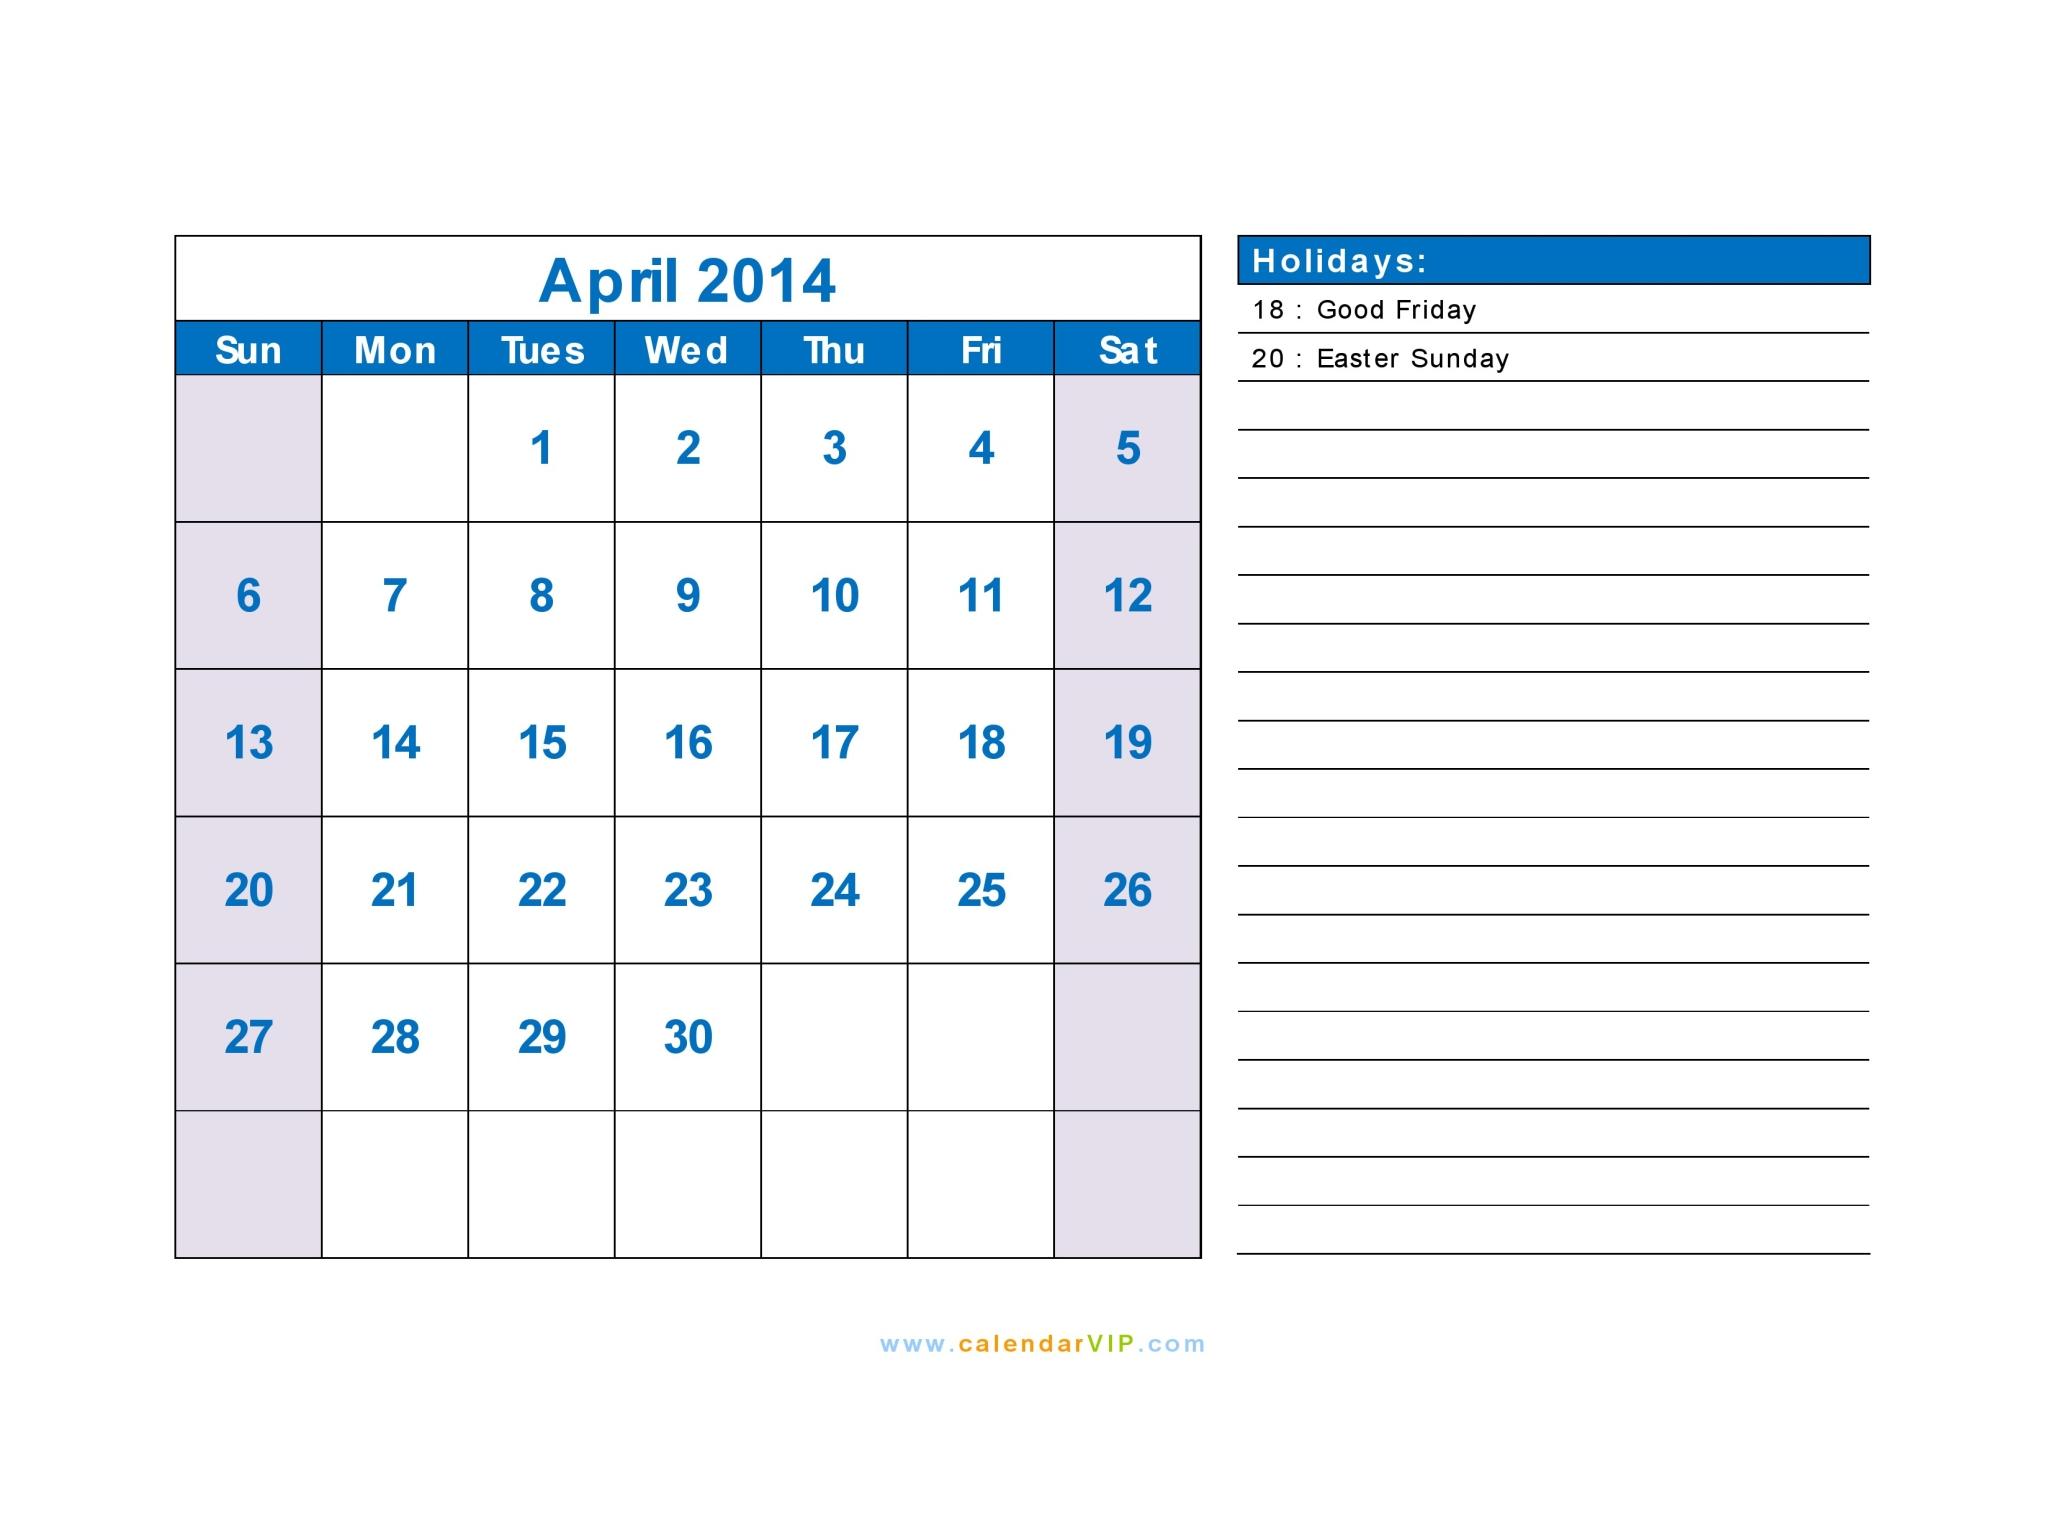 April 2014 Calendar Blank Printable Calendar Template In Pdf Word